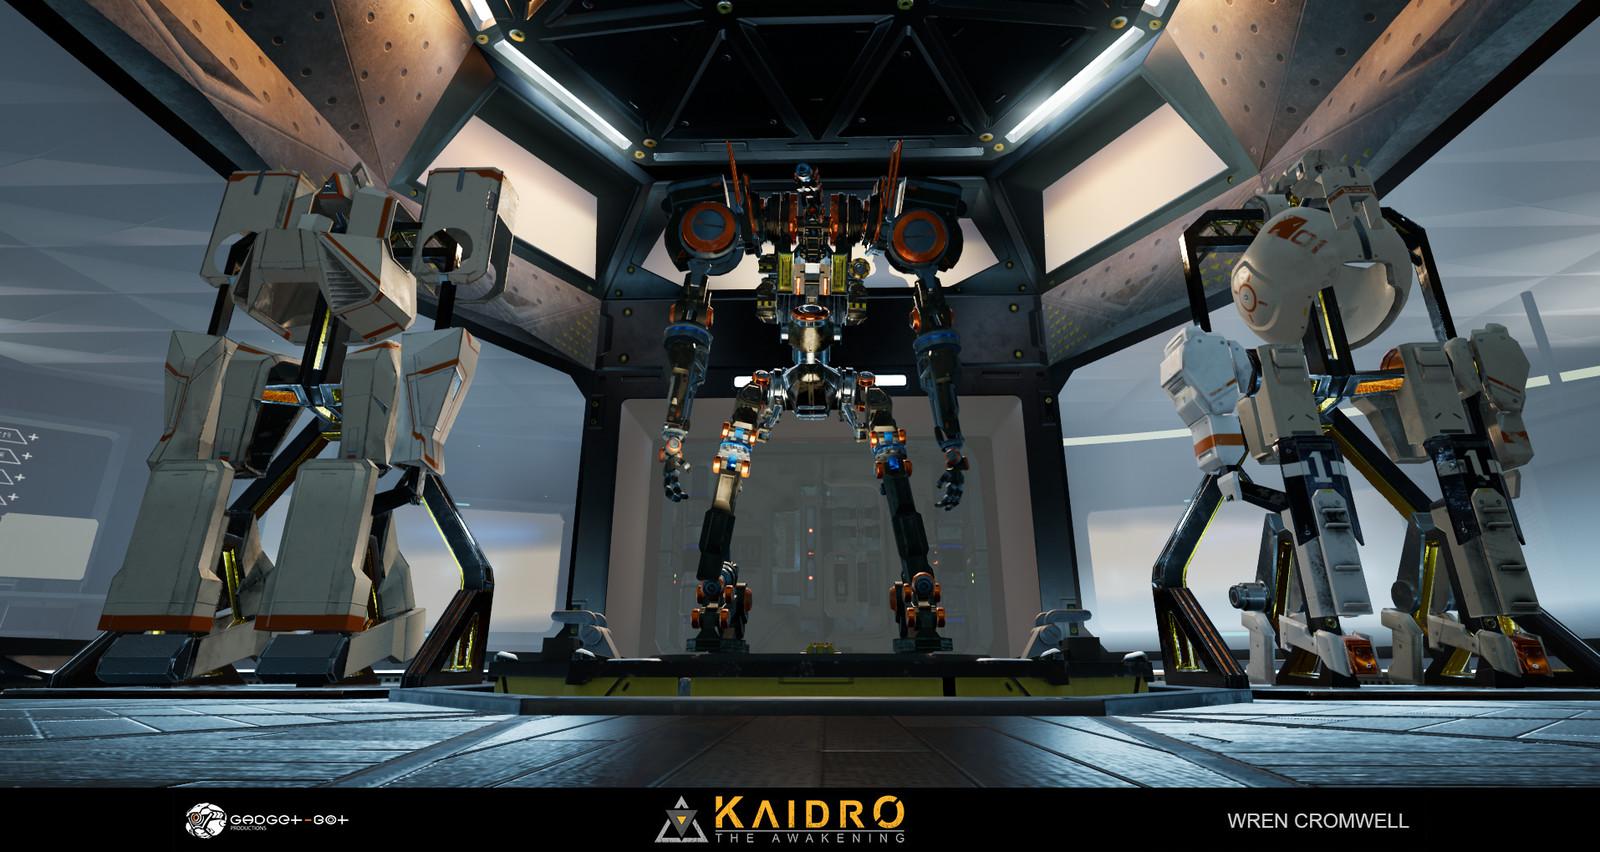 Armor set on the left was modeled by Rodrigo Brea